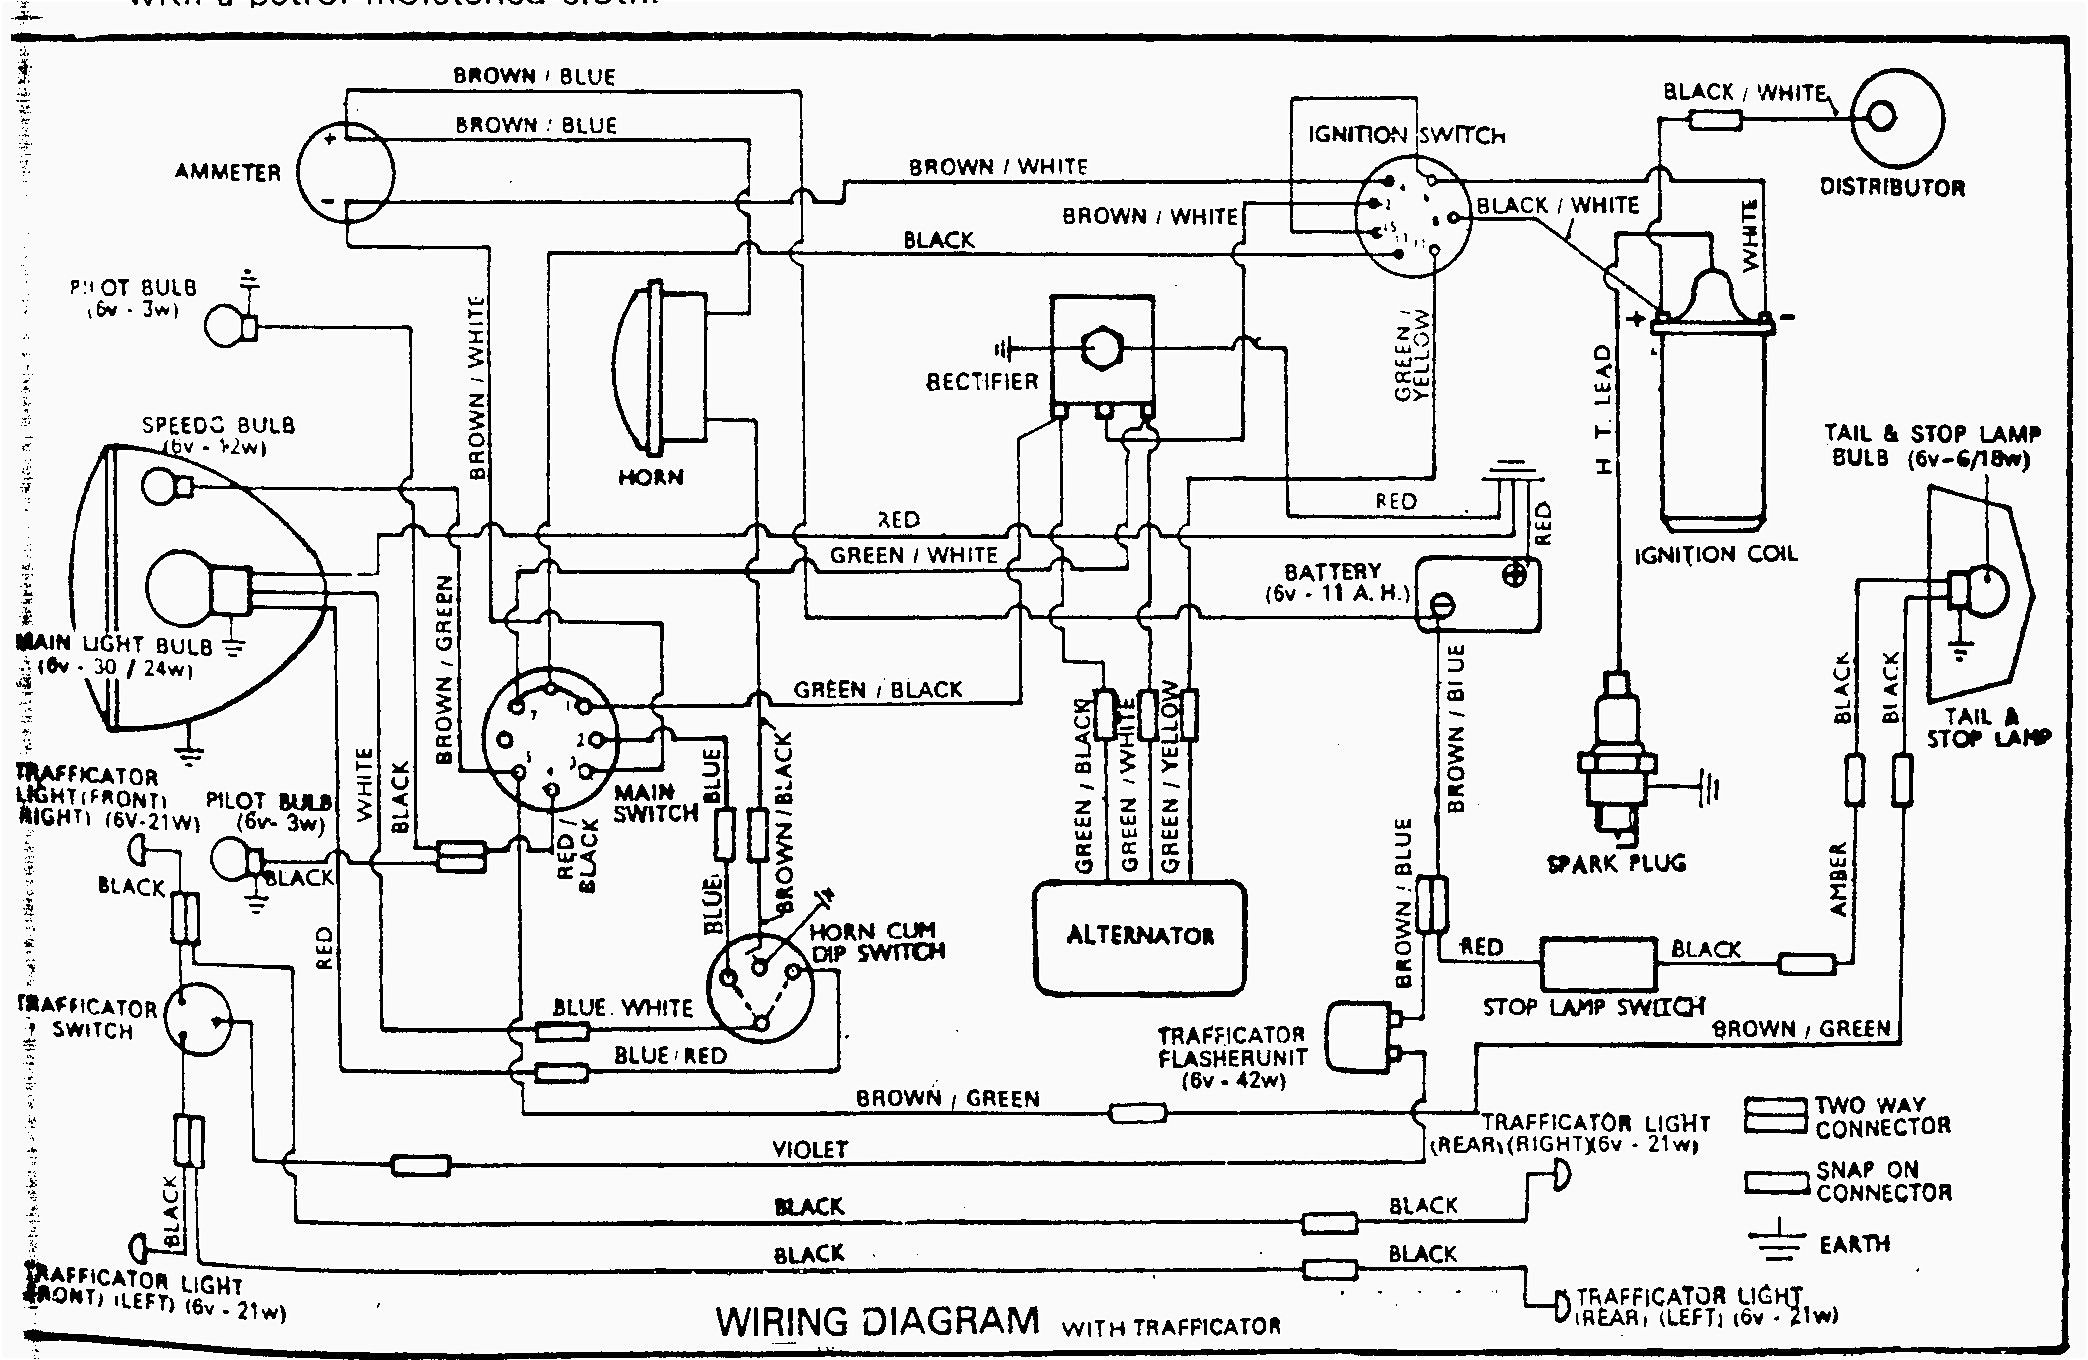 Unique Wiring Diagram For Domestic Consumer Unit Diagram Diagramtemplate Diagramsample Circuito Fondos De Pantalla Animales Pantalla